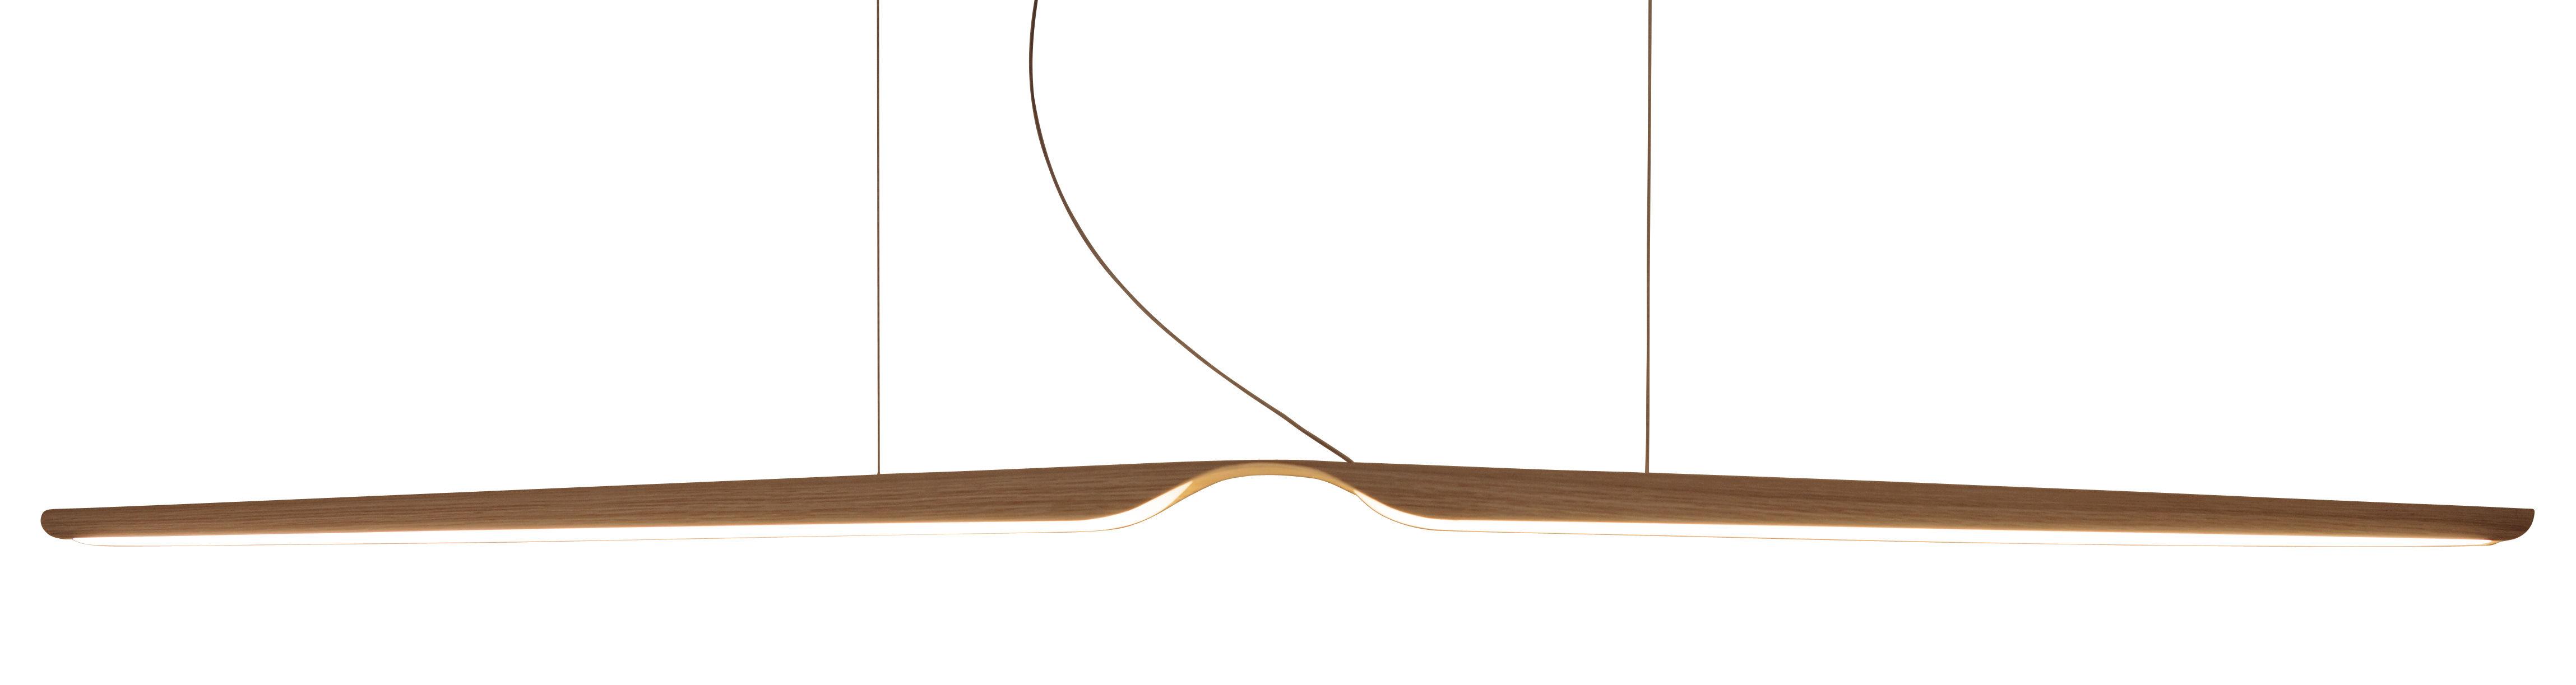 Lighting - Pendant Lighting - Swan Pendant by Tunto - Oak - Oak